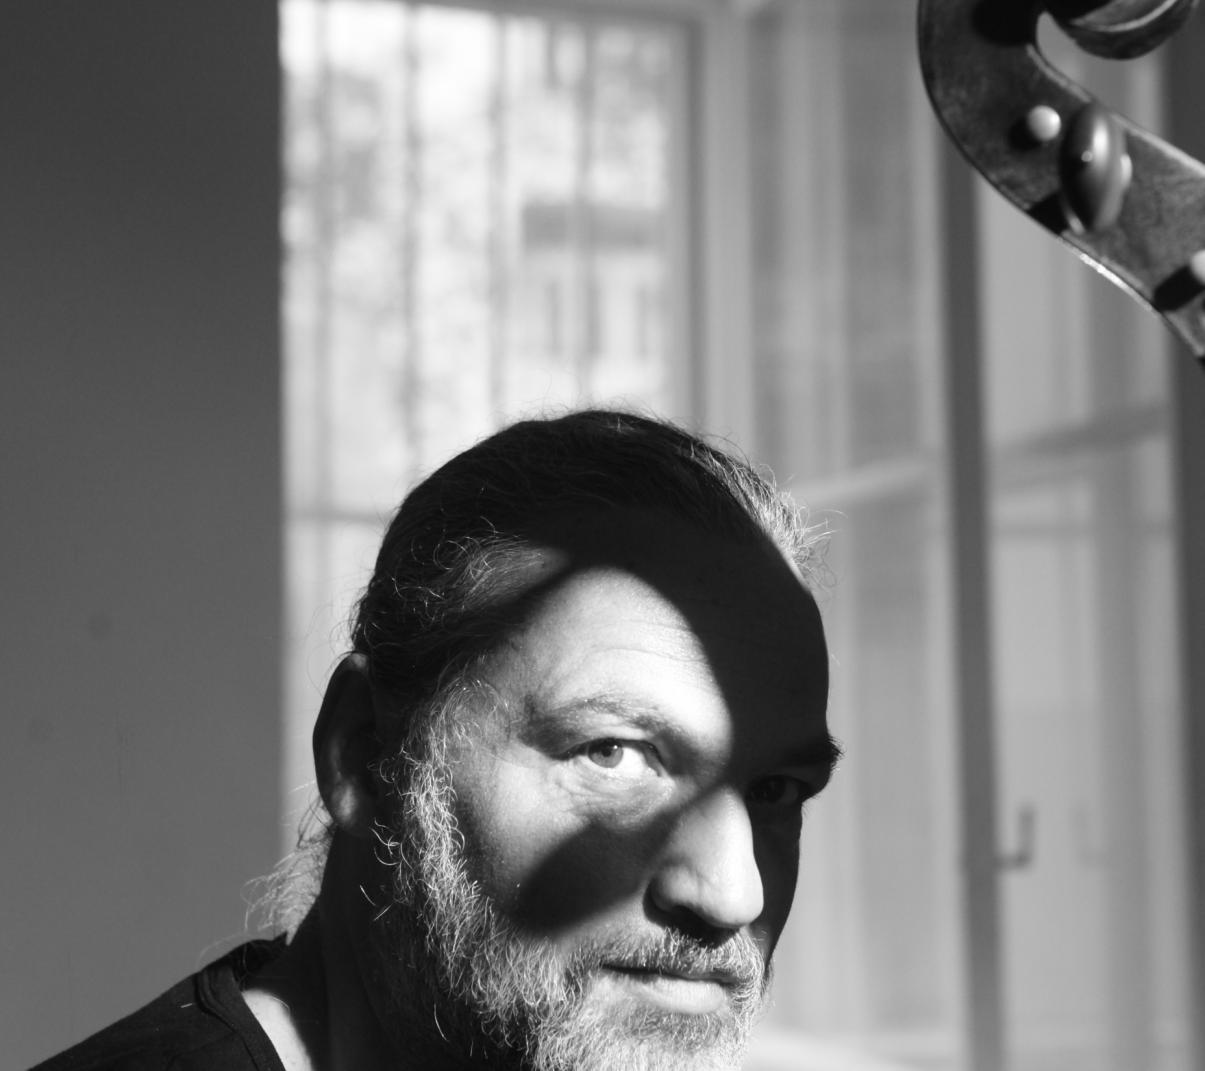 Jiří Bárta (foto Antonín Kratochvíl, 2018)